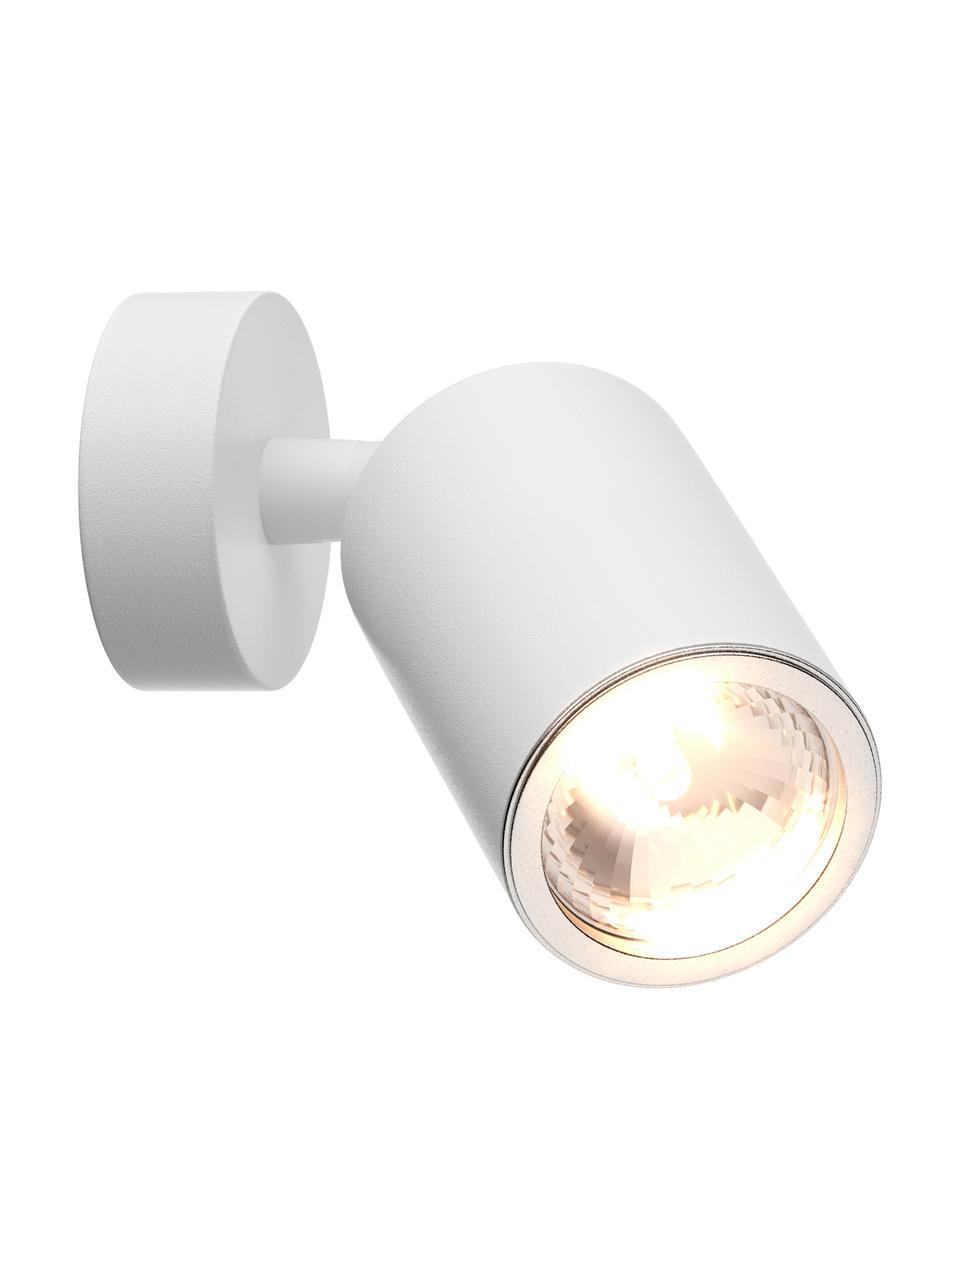 Kinkiet/lampa sufitowa Tori, Biały, 6 x 13 cm